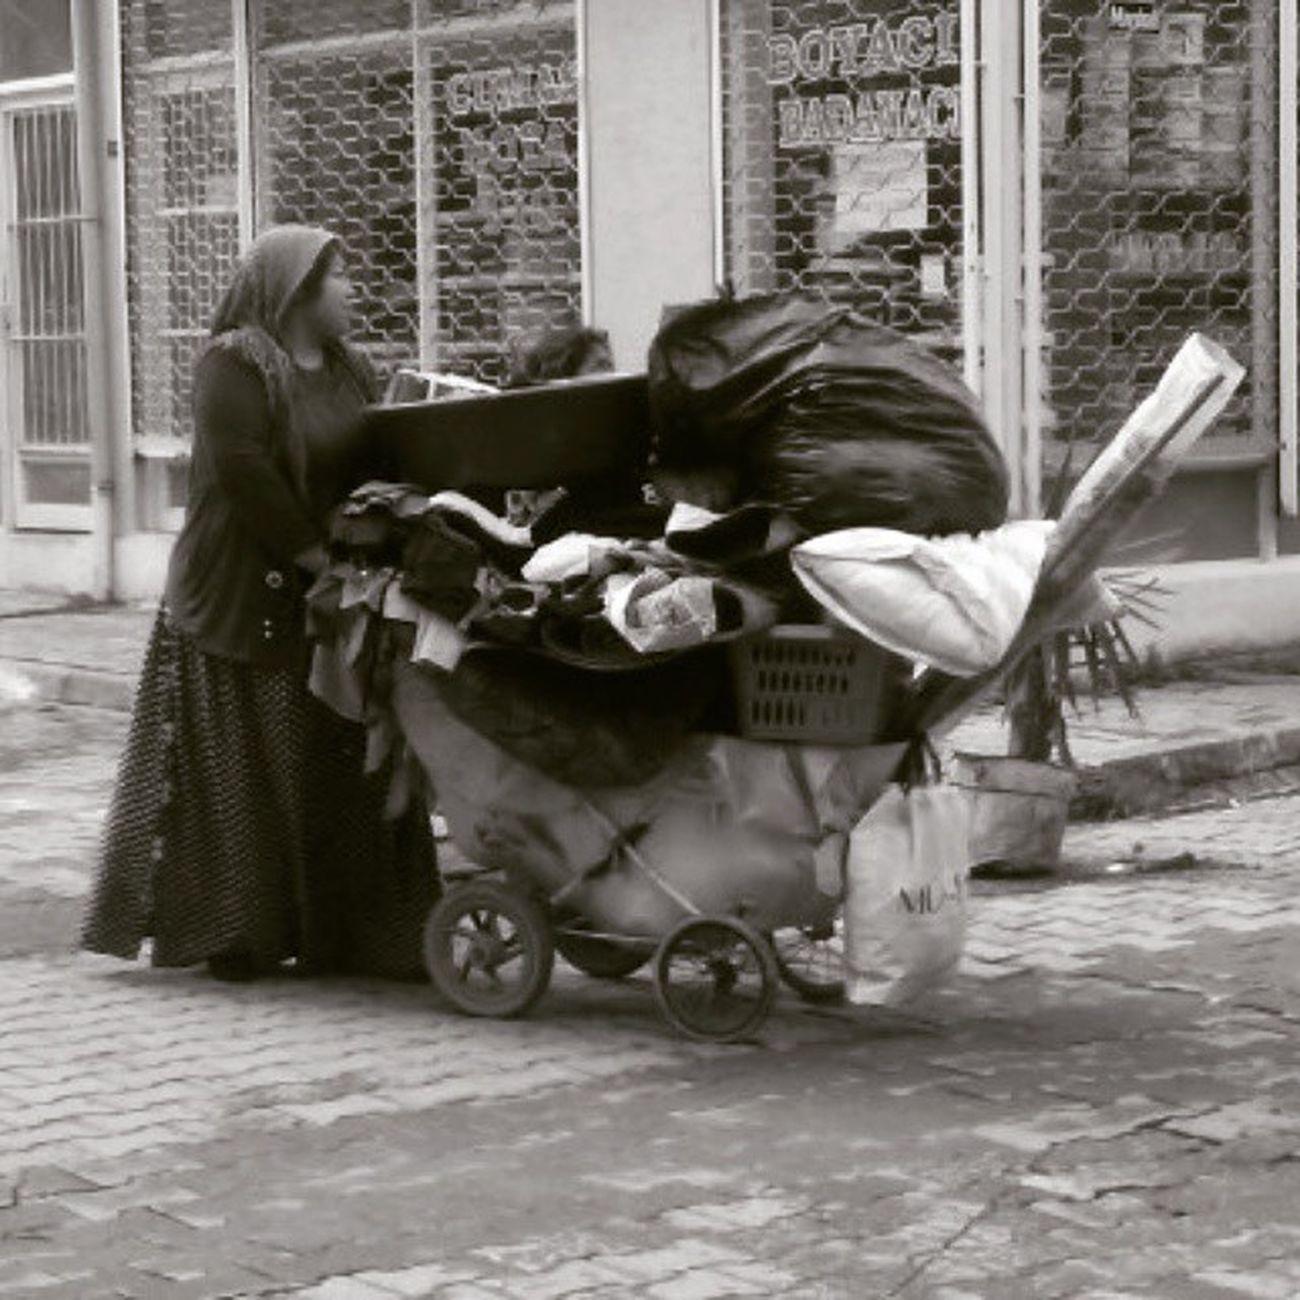 Bugununkaresi Blackadnwhite Benimkadrajım Bendenbirkare siyah street_photo_club phototag_nature phototag_street photography Adana fotografvakti